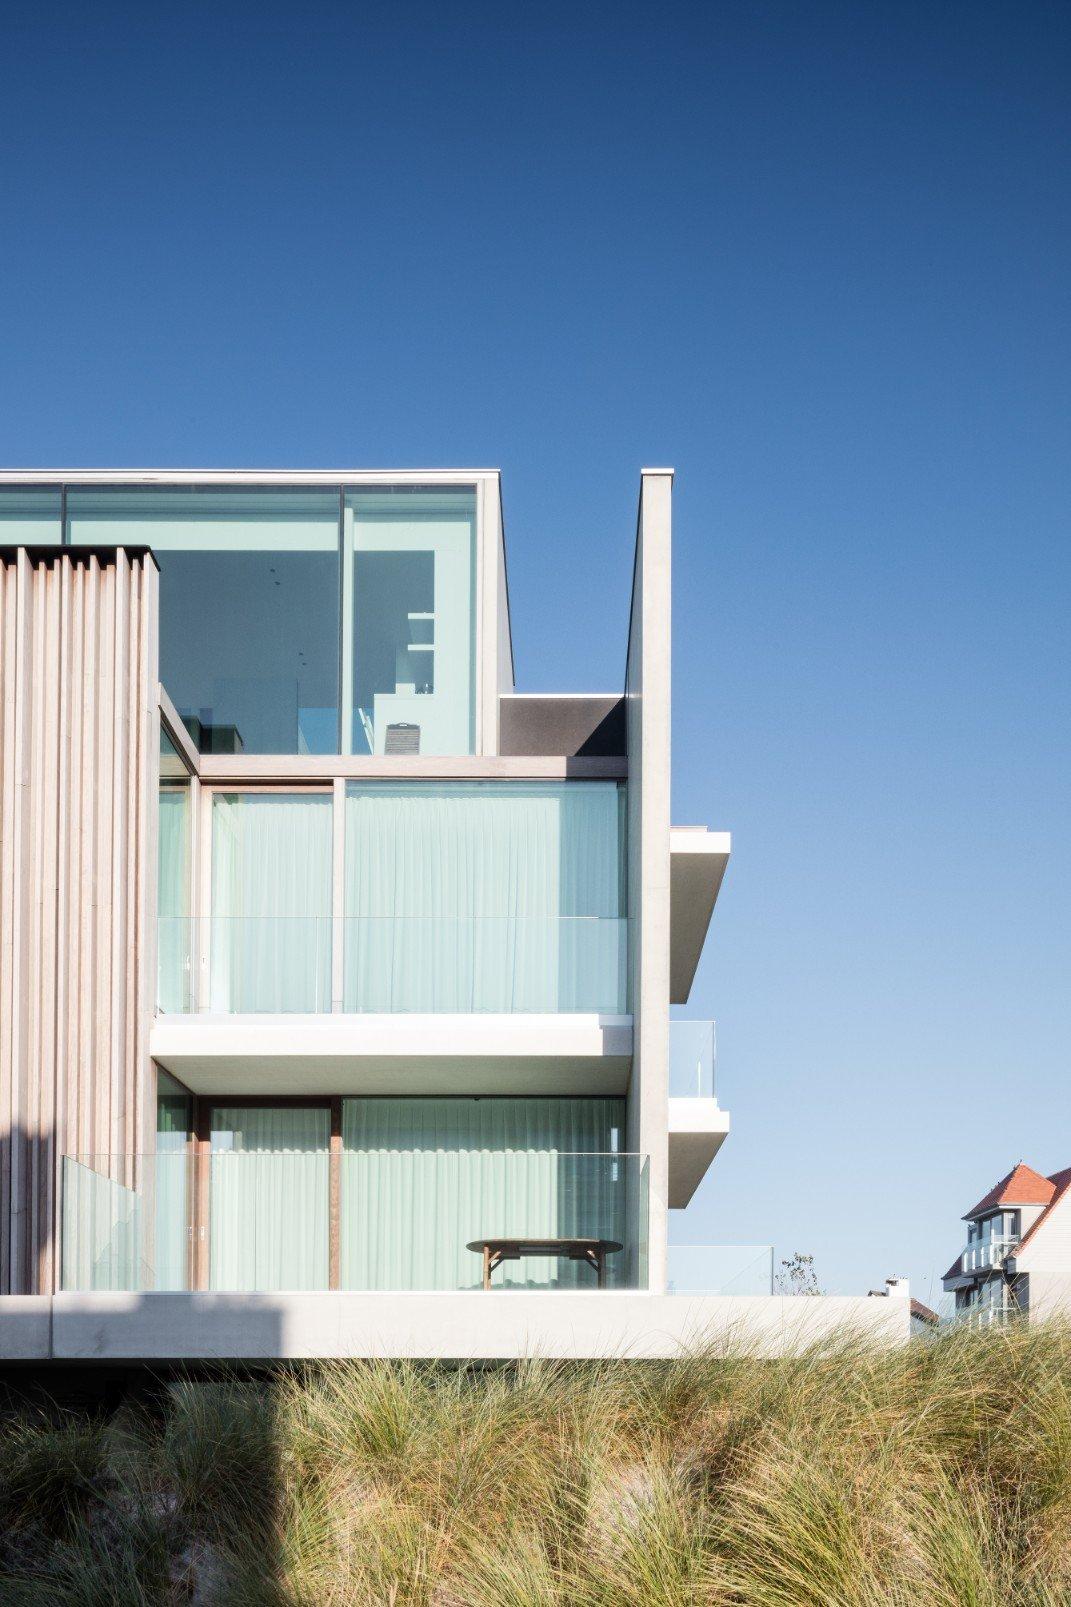 Rietveldprojects-Residence-ON-appartement-design-architectuur-kust-tvdv6.jpg